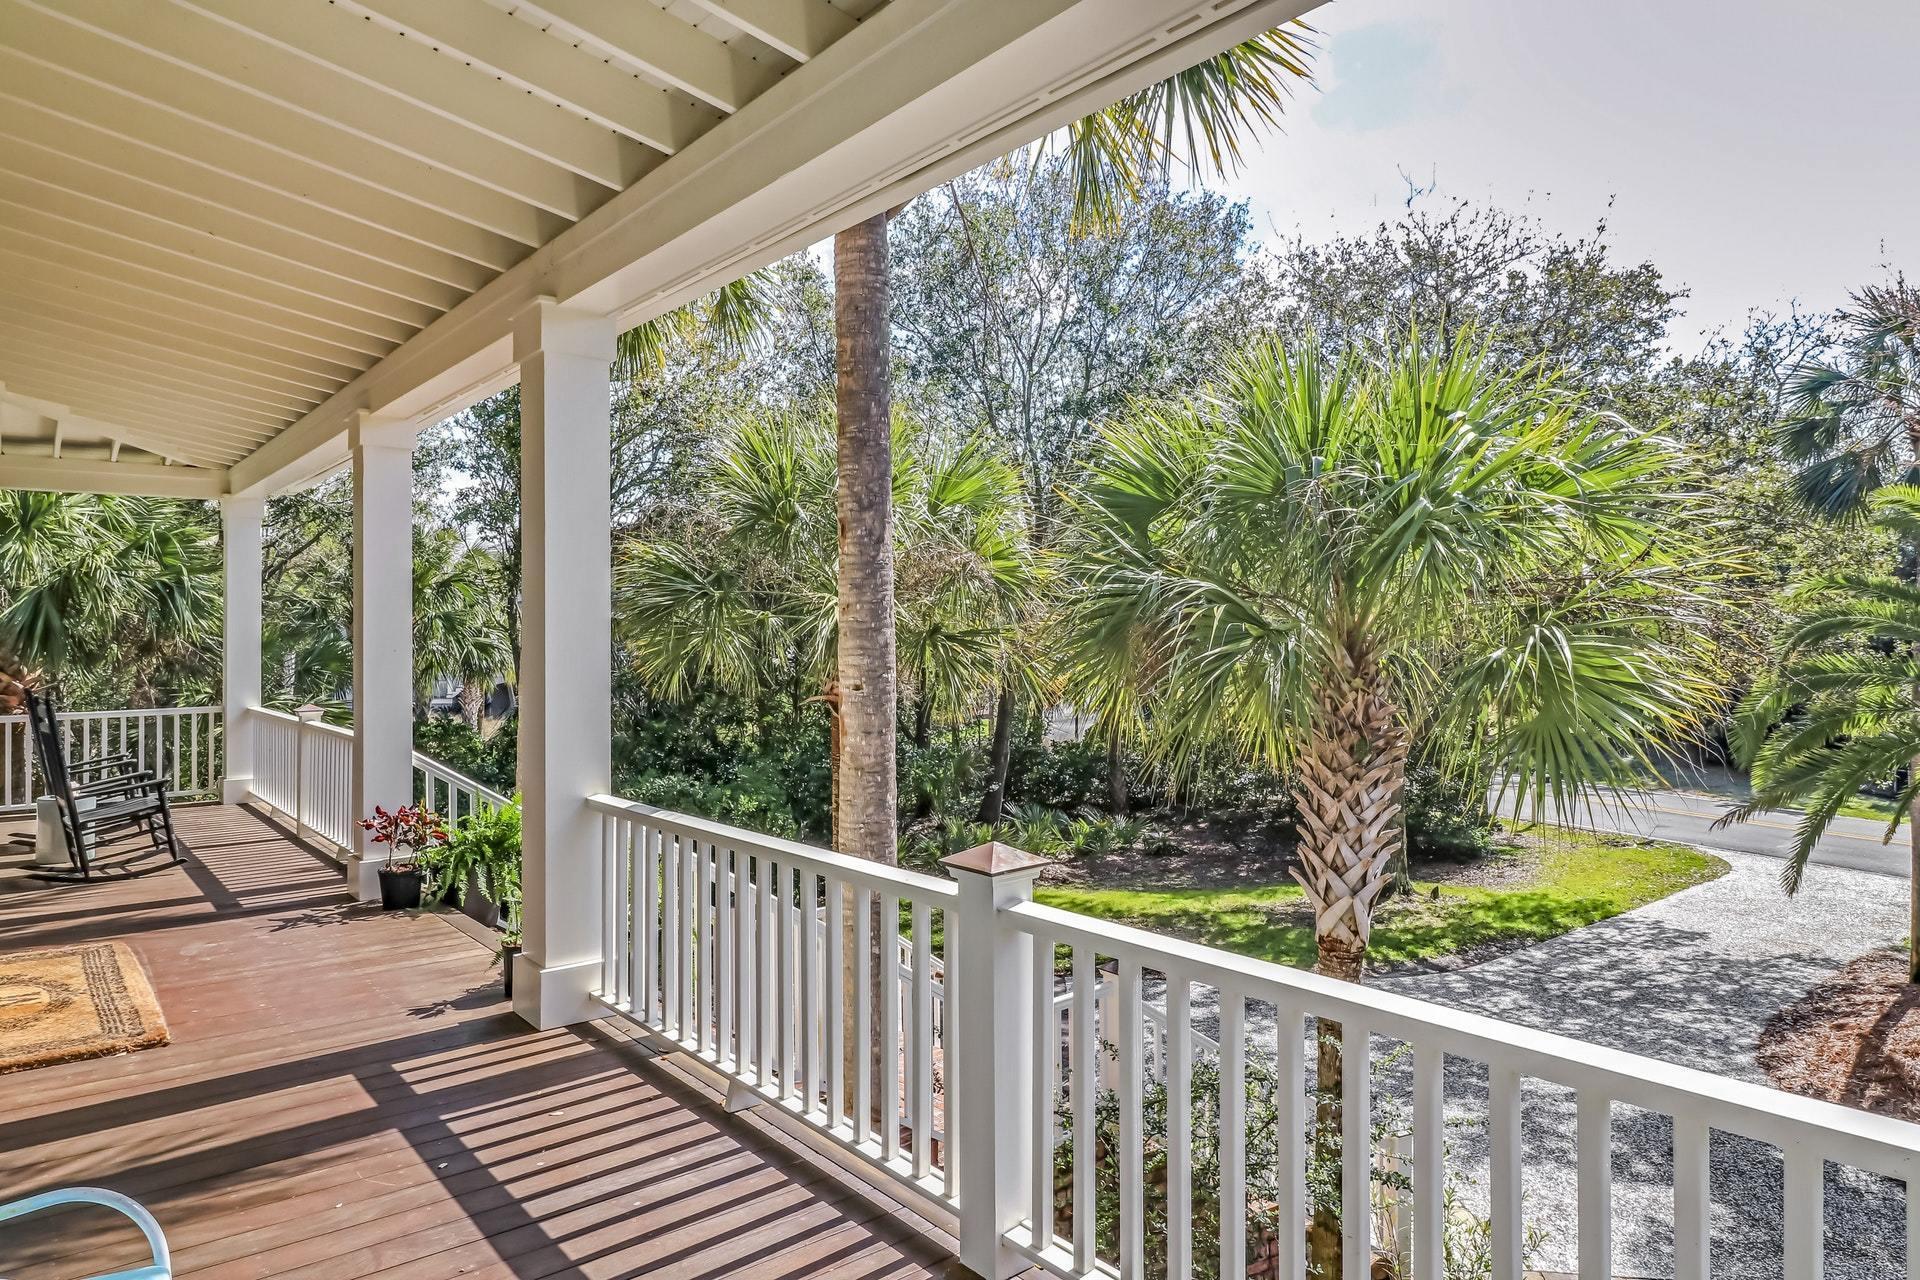 Waterway Island Homes For Sale - 7 Waterway Island Drive, Isle of Palms, SC - 6